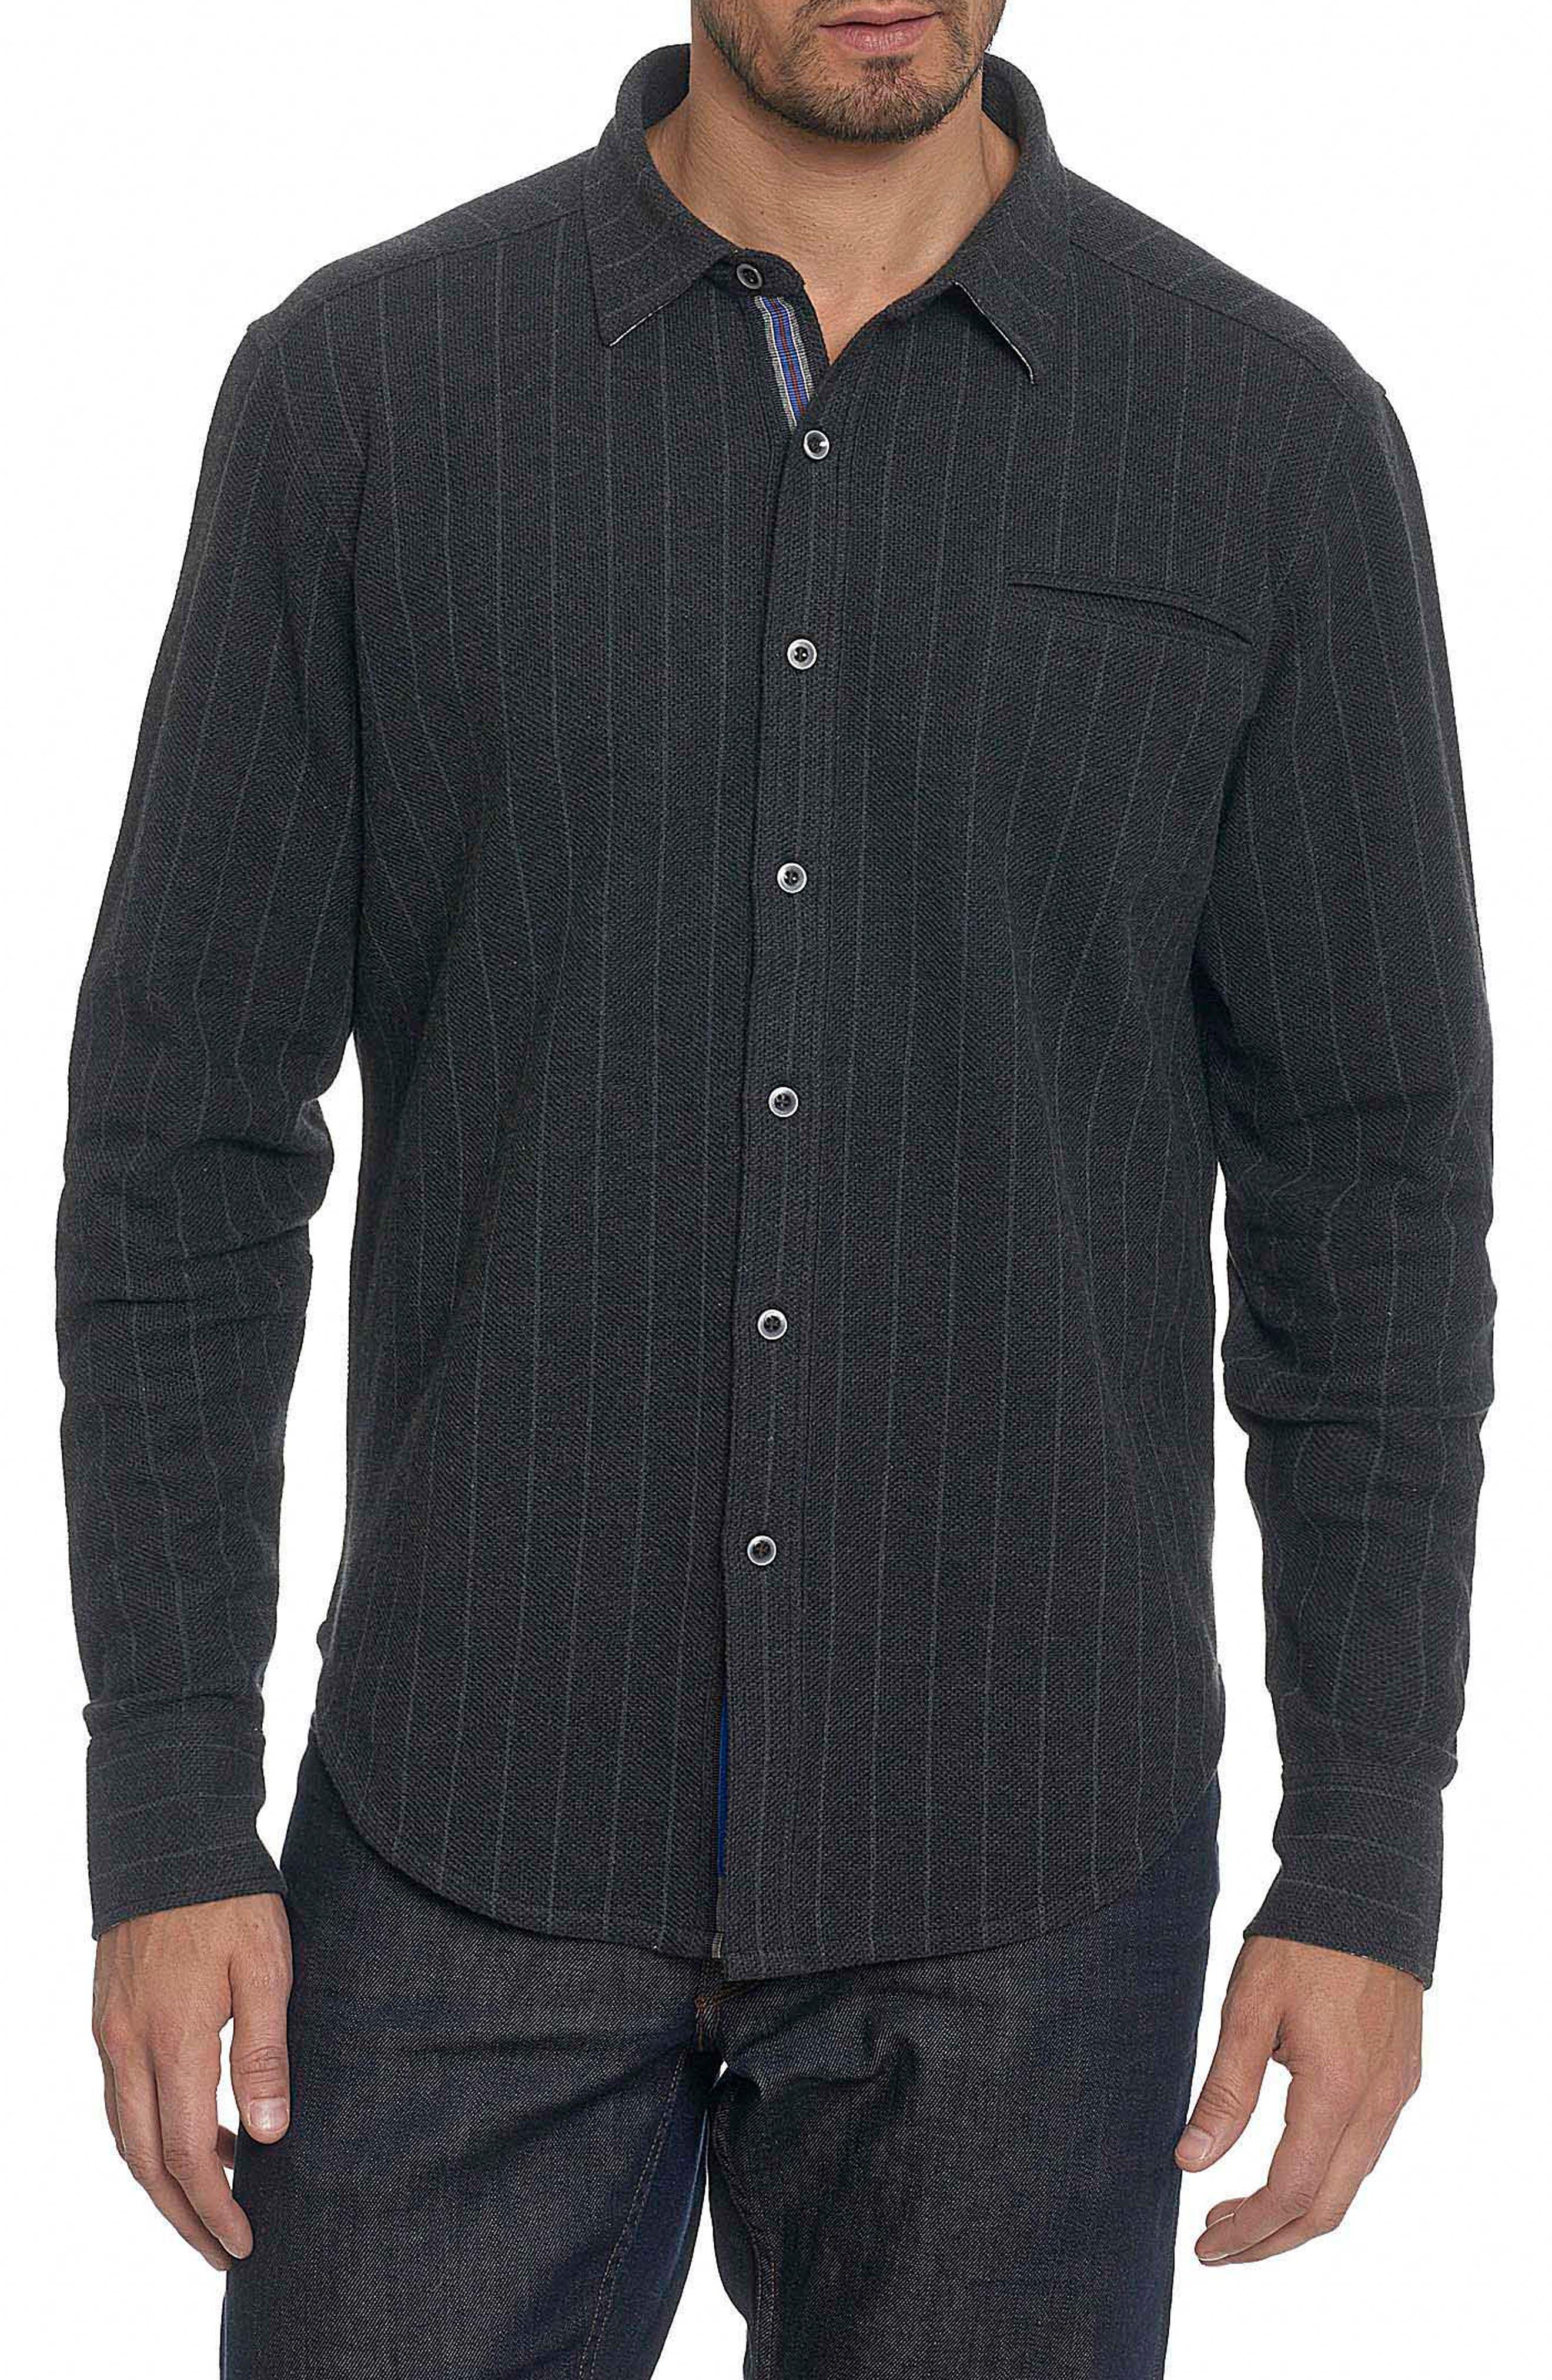 Robert Graham Amboy Classic Fit Shirt Jacket